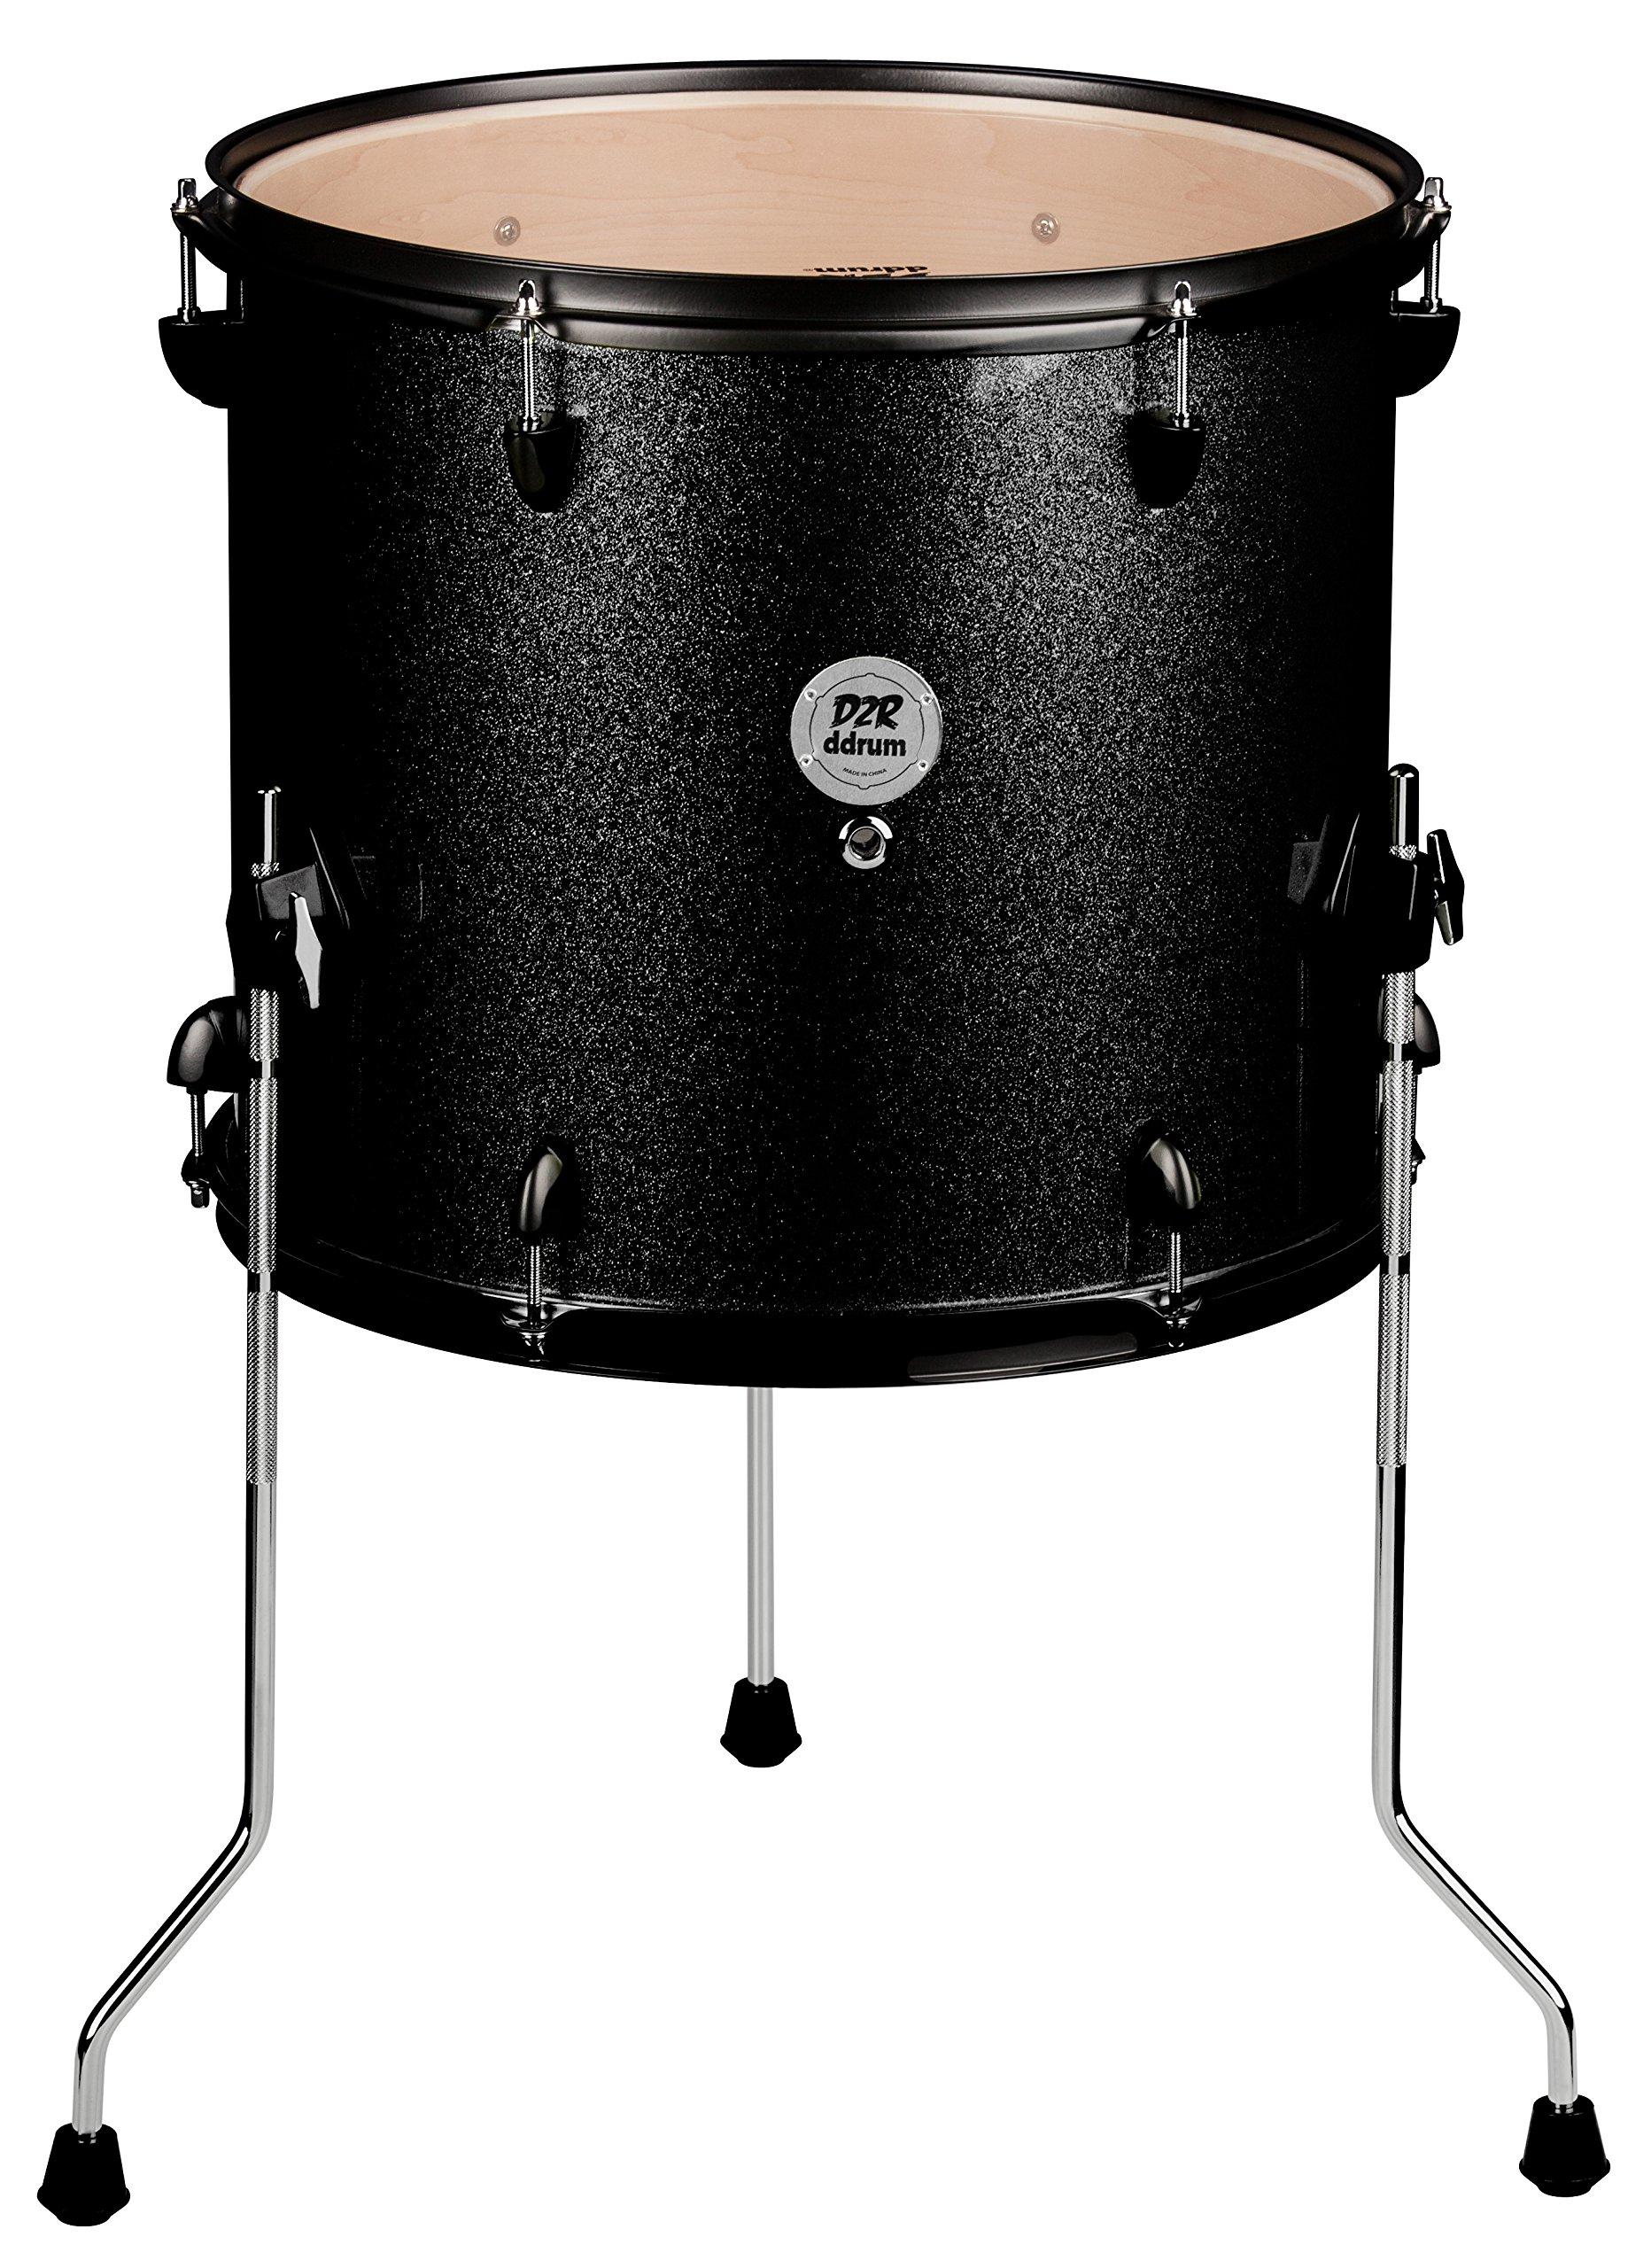 ddrum D2R FT 12X14 BLK SPKL Series Sparkle Floor Tom Drum Set, Black